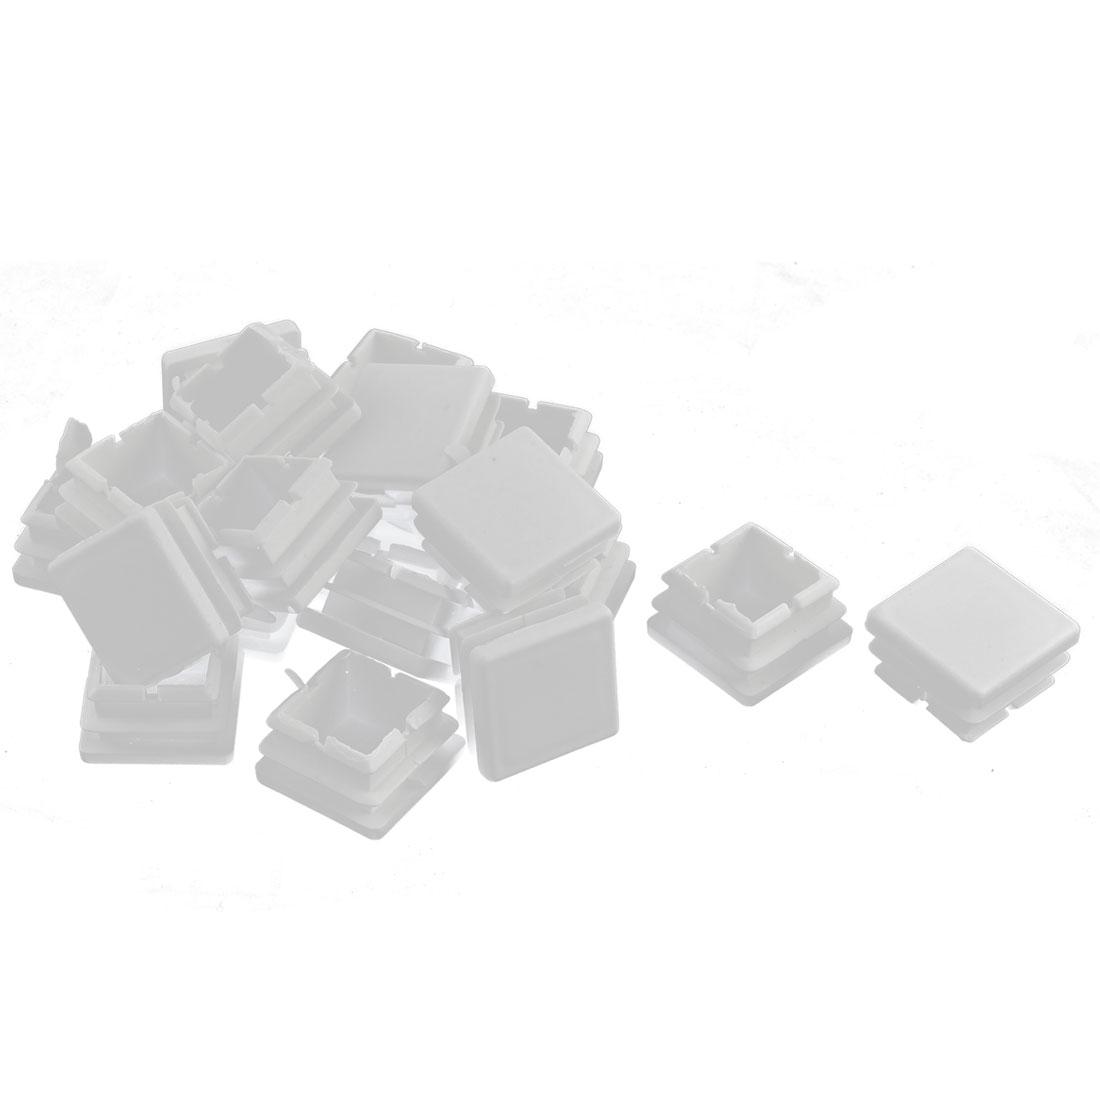 Plastic Square Tube Pipe Inserts End Blanking Caps White 25mmx25mm 20 Pcs